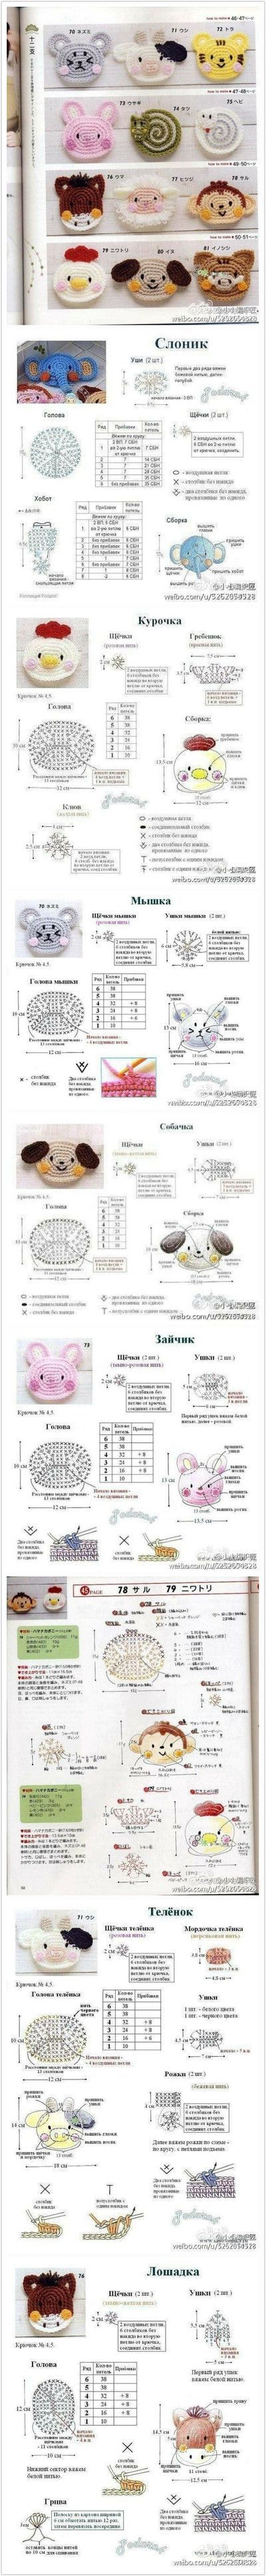 堆糖-美好生活研究所 - Animal Crochet appliques